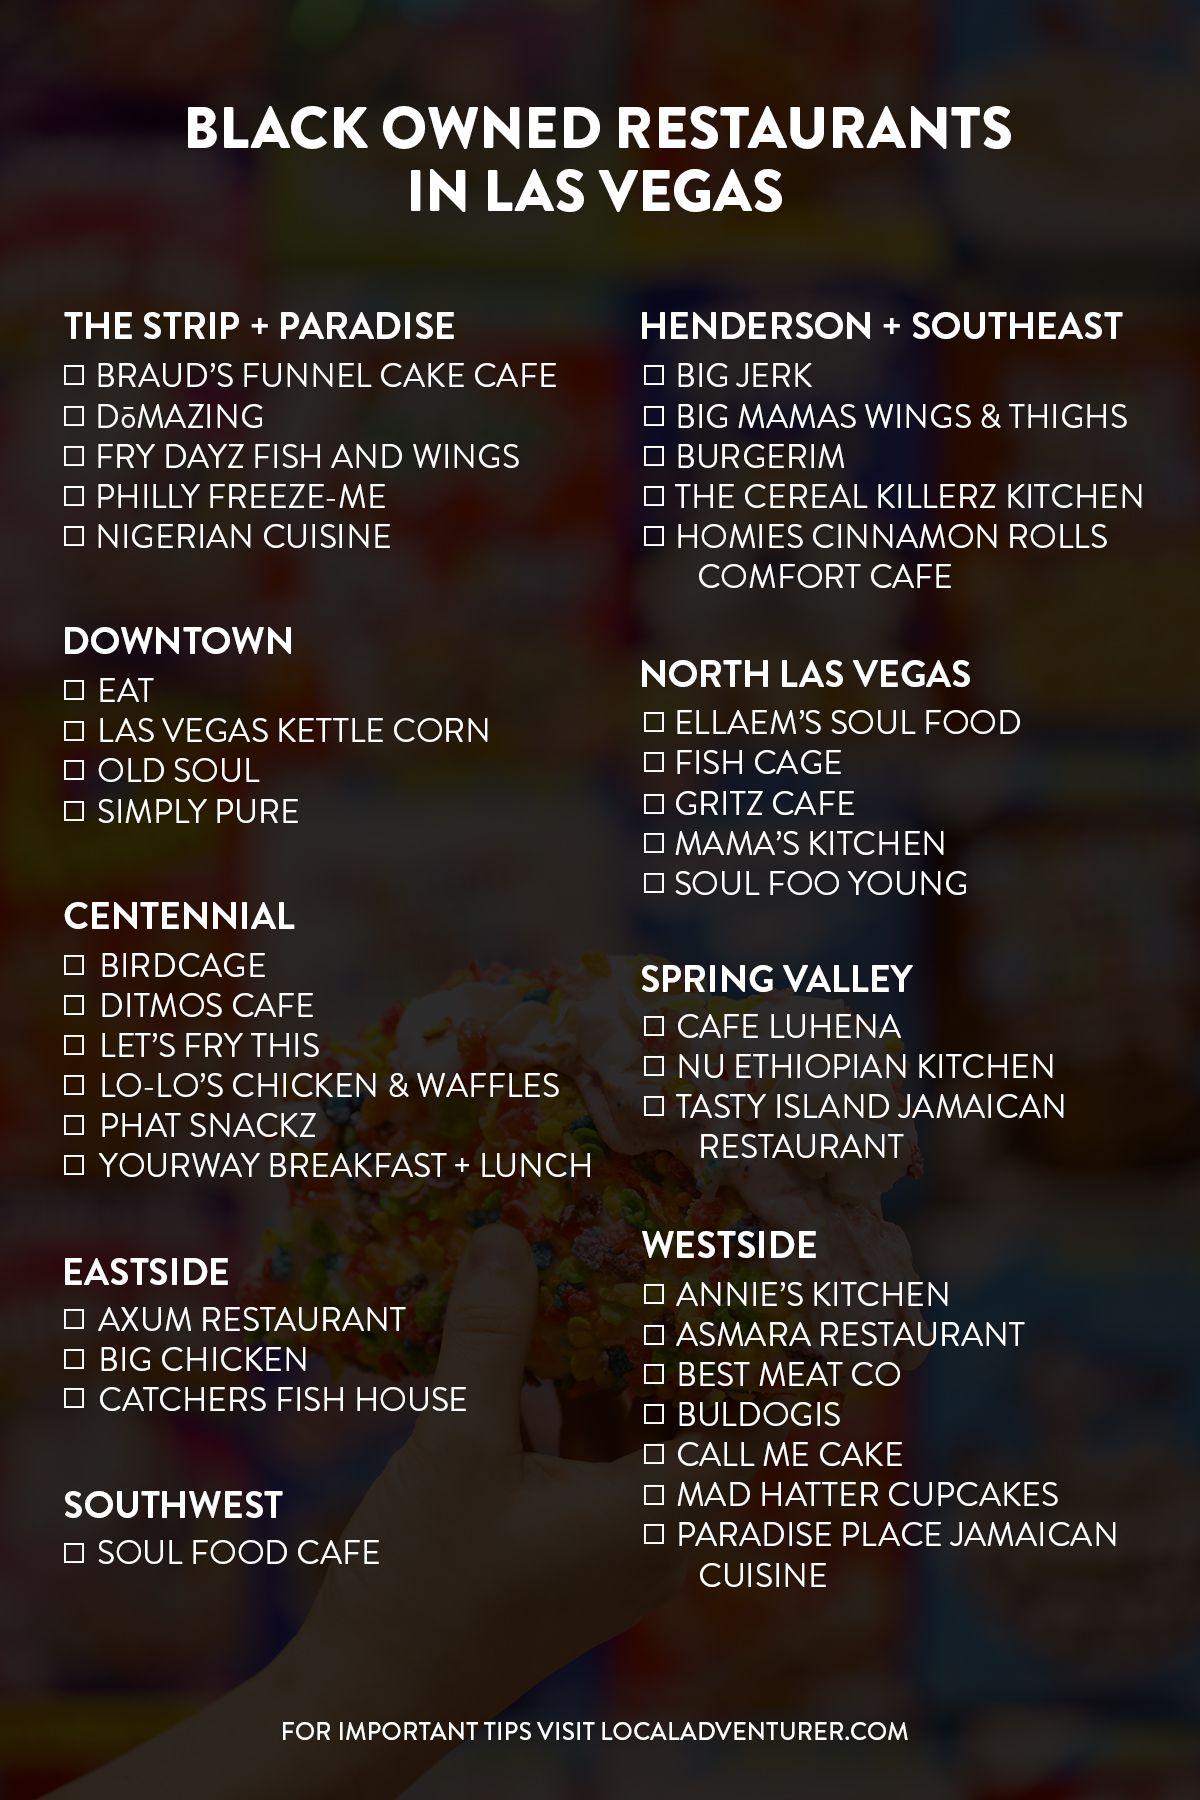 39 Black Owned Restaurants In Las Vegas Local Adventurer Las Vegas Nevada Travel Road Trip Fun